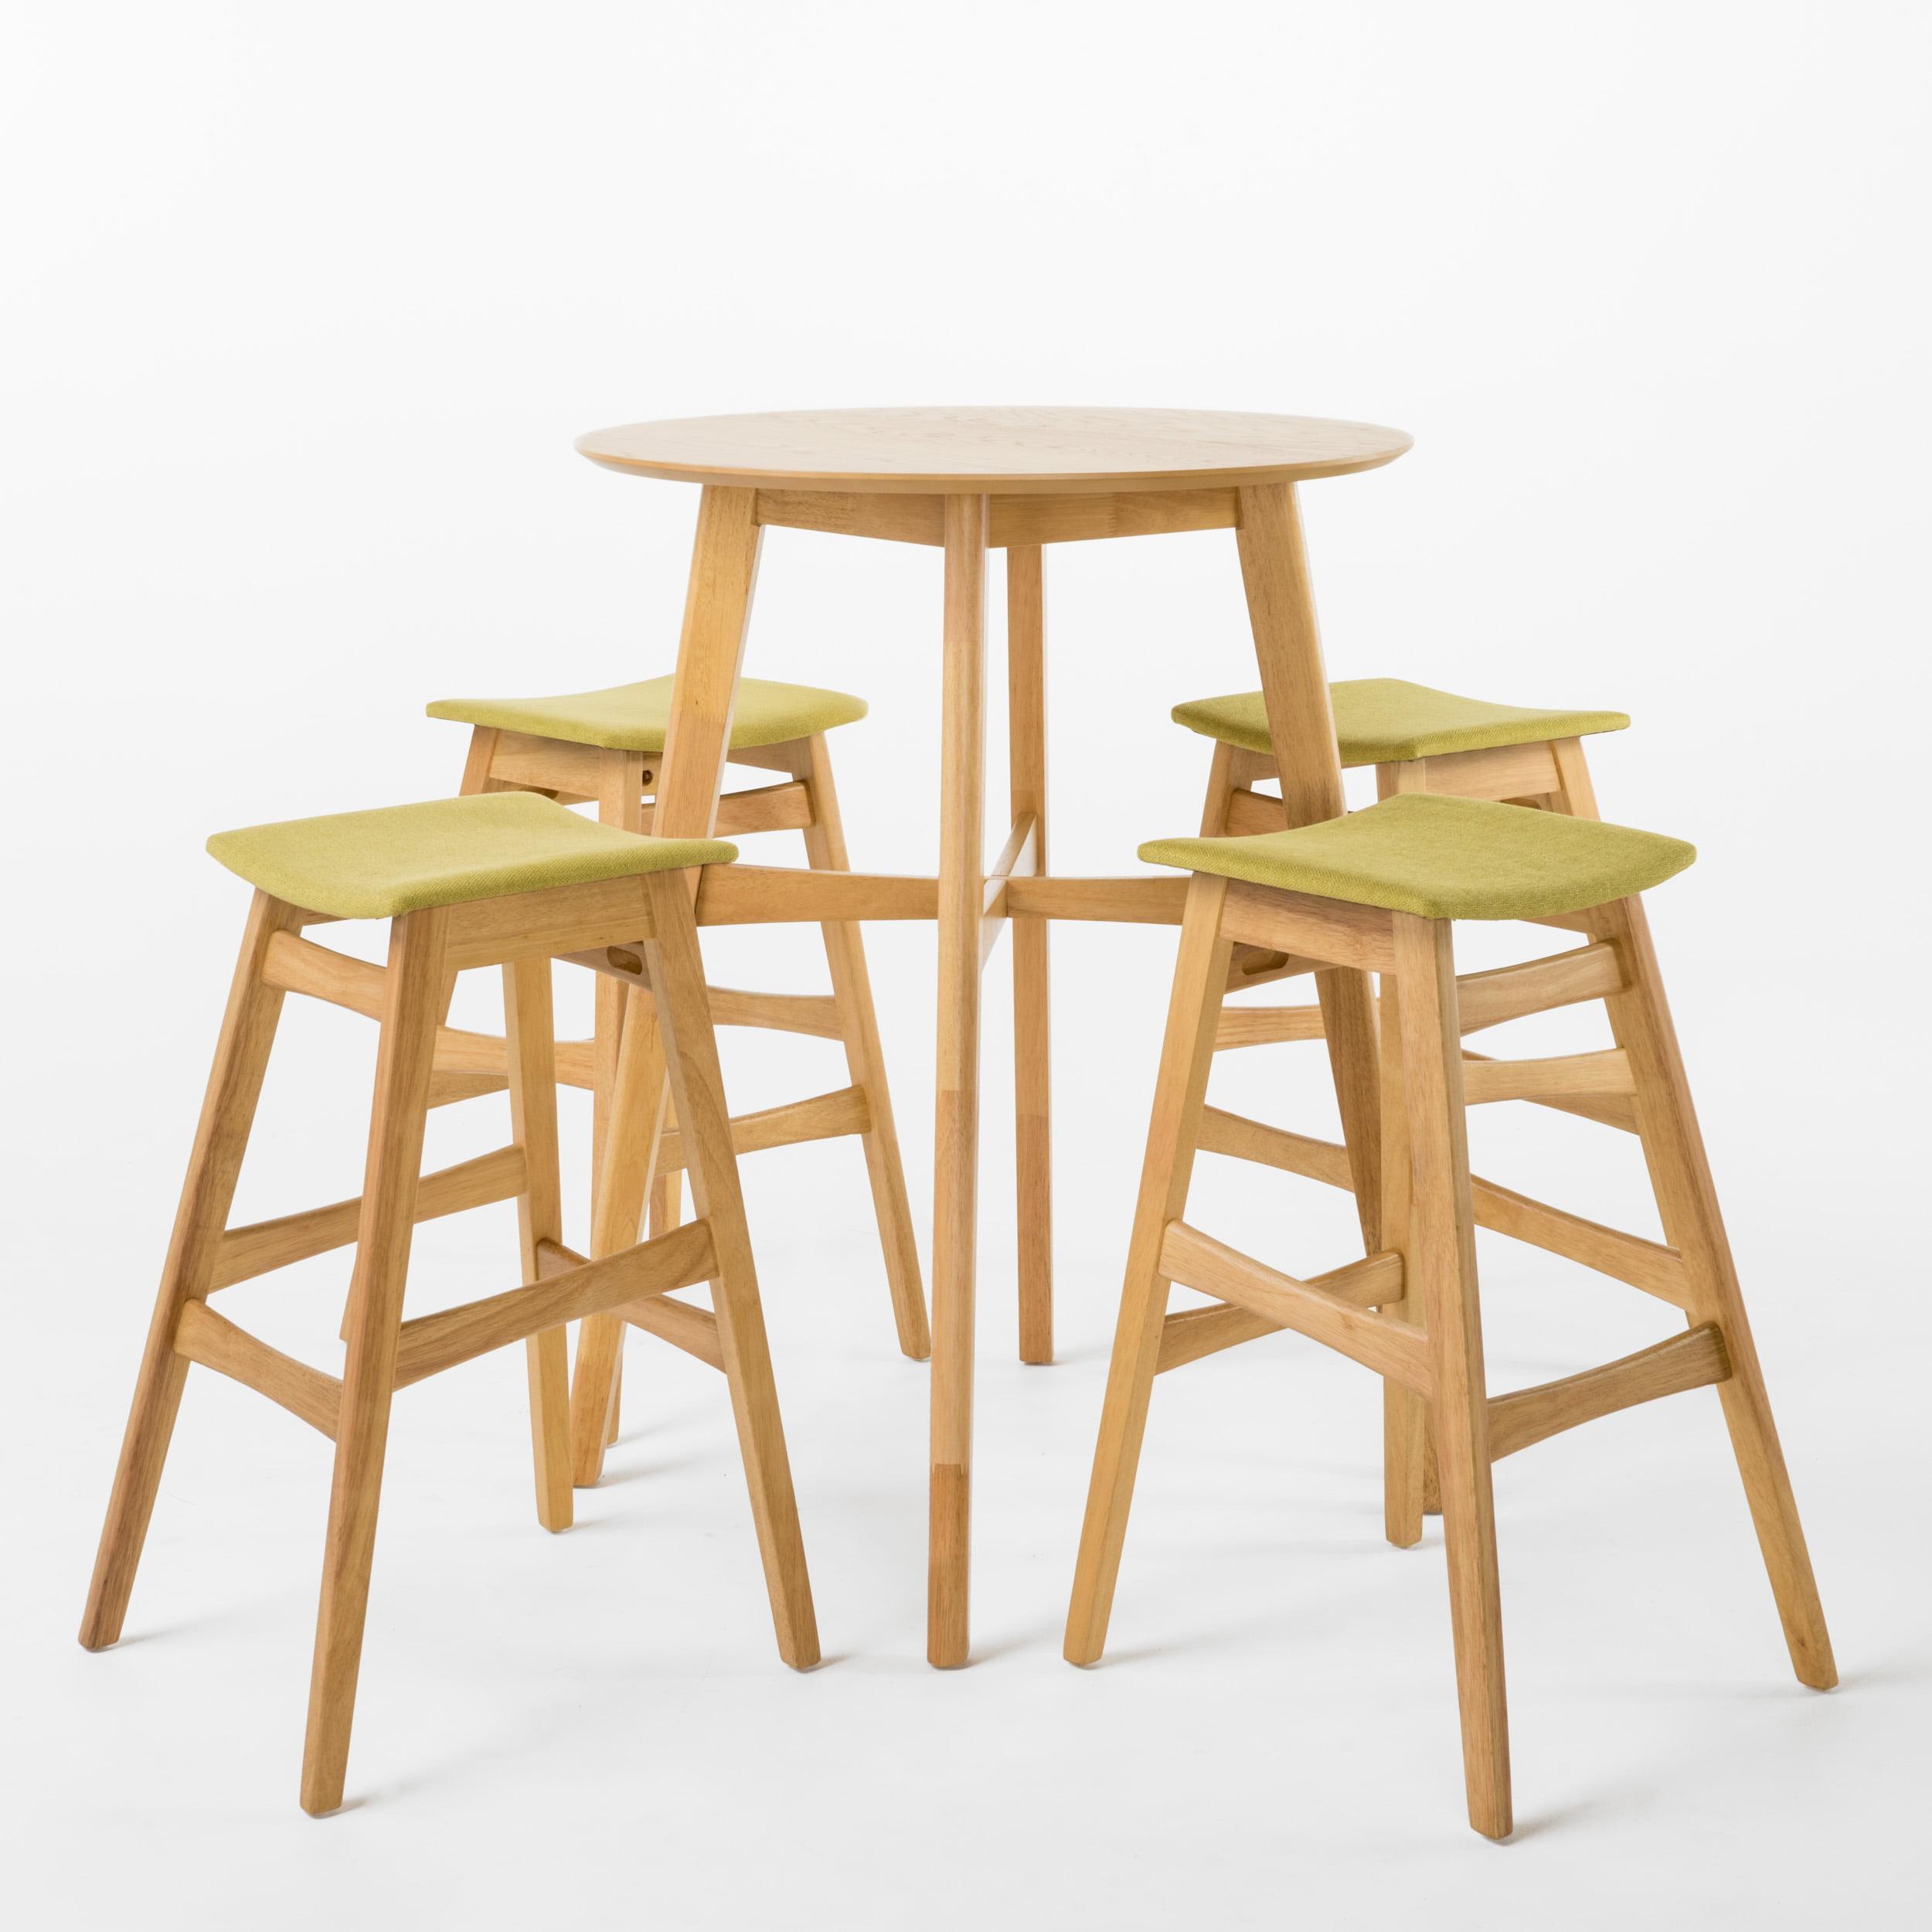 Lassette Circular 5-Piece Bar Height Dining Set, Green Tea/ Natural Oak Finish